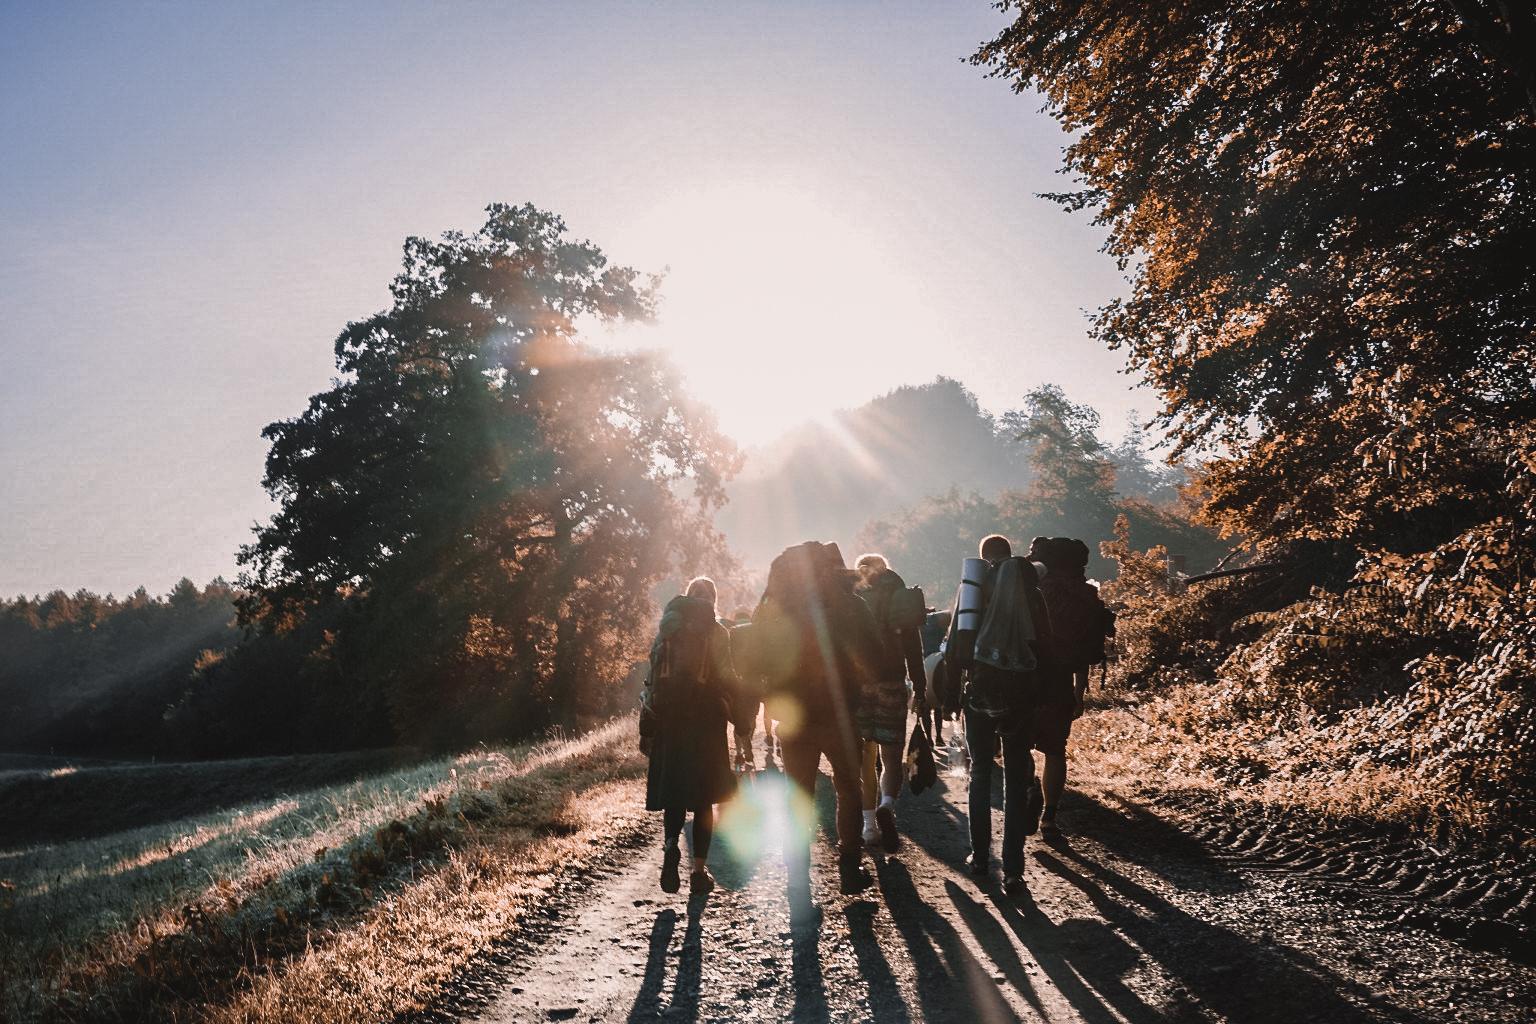 Gruppe wandert in den Sonnenschein